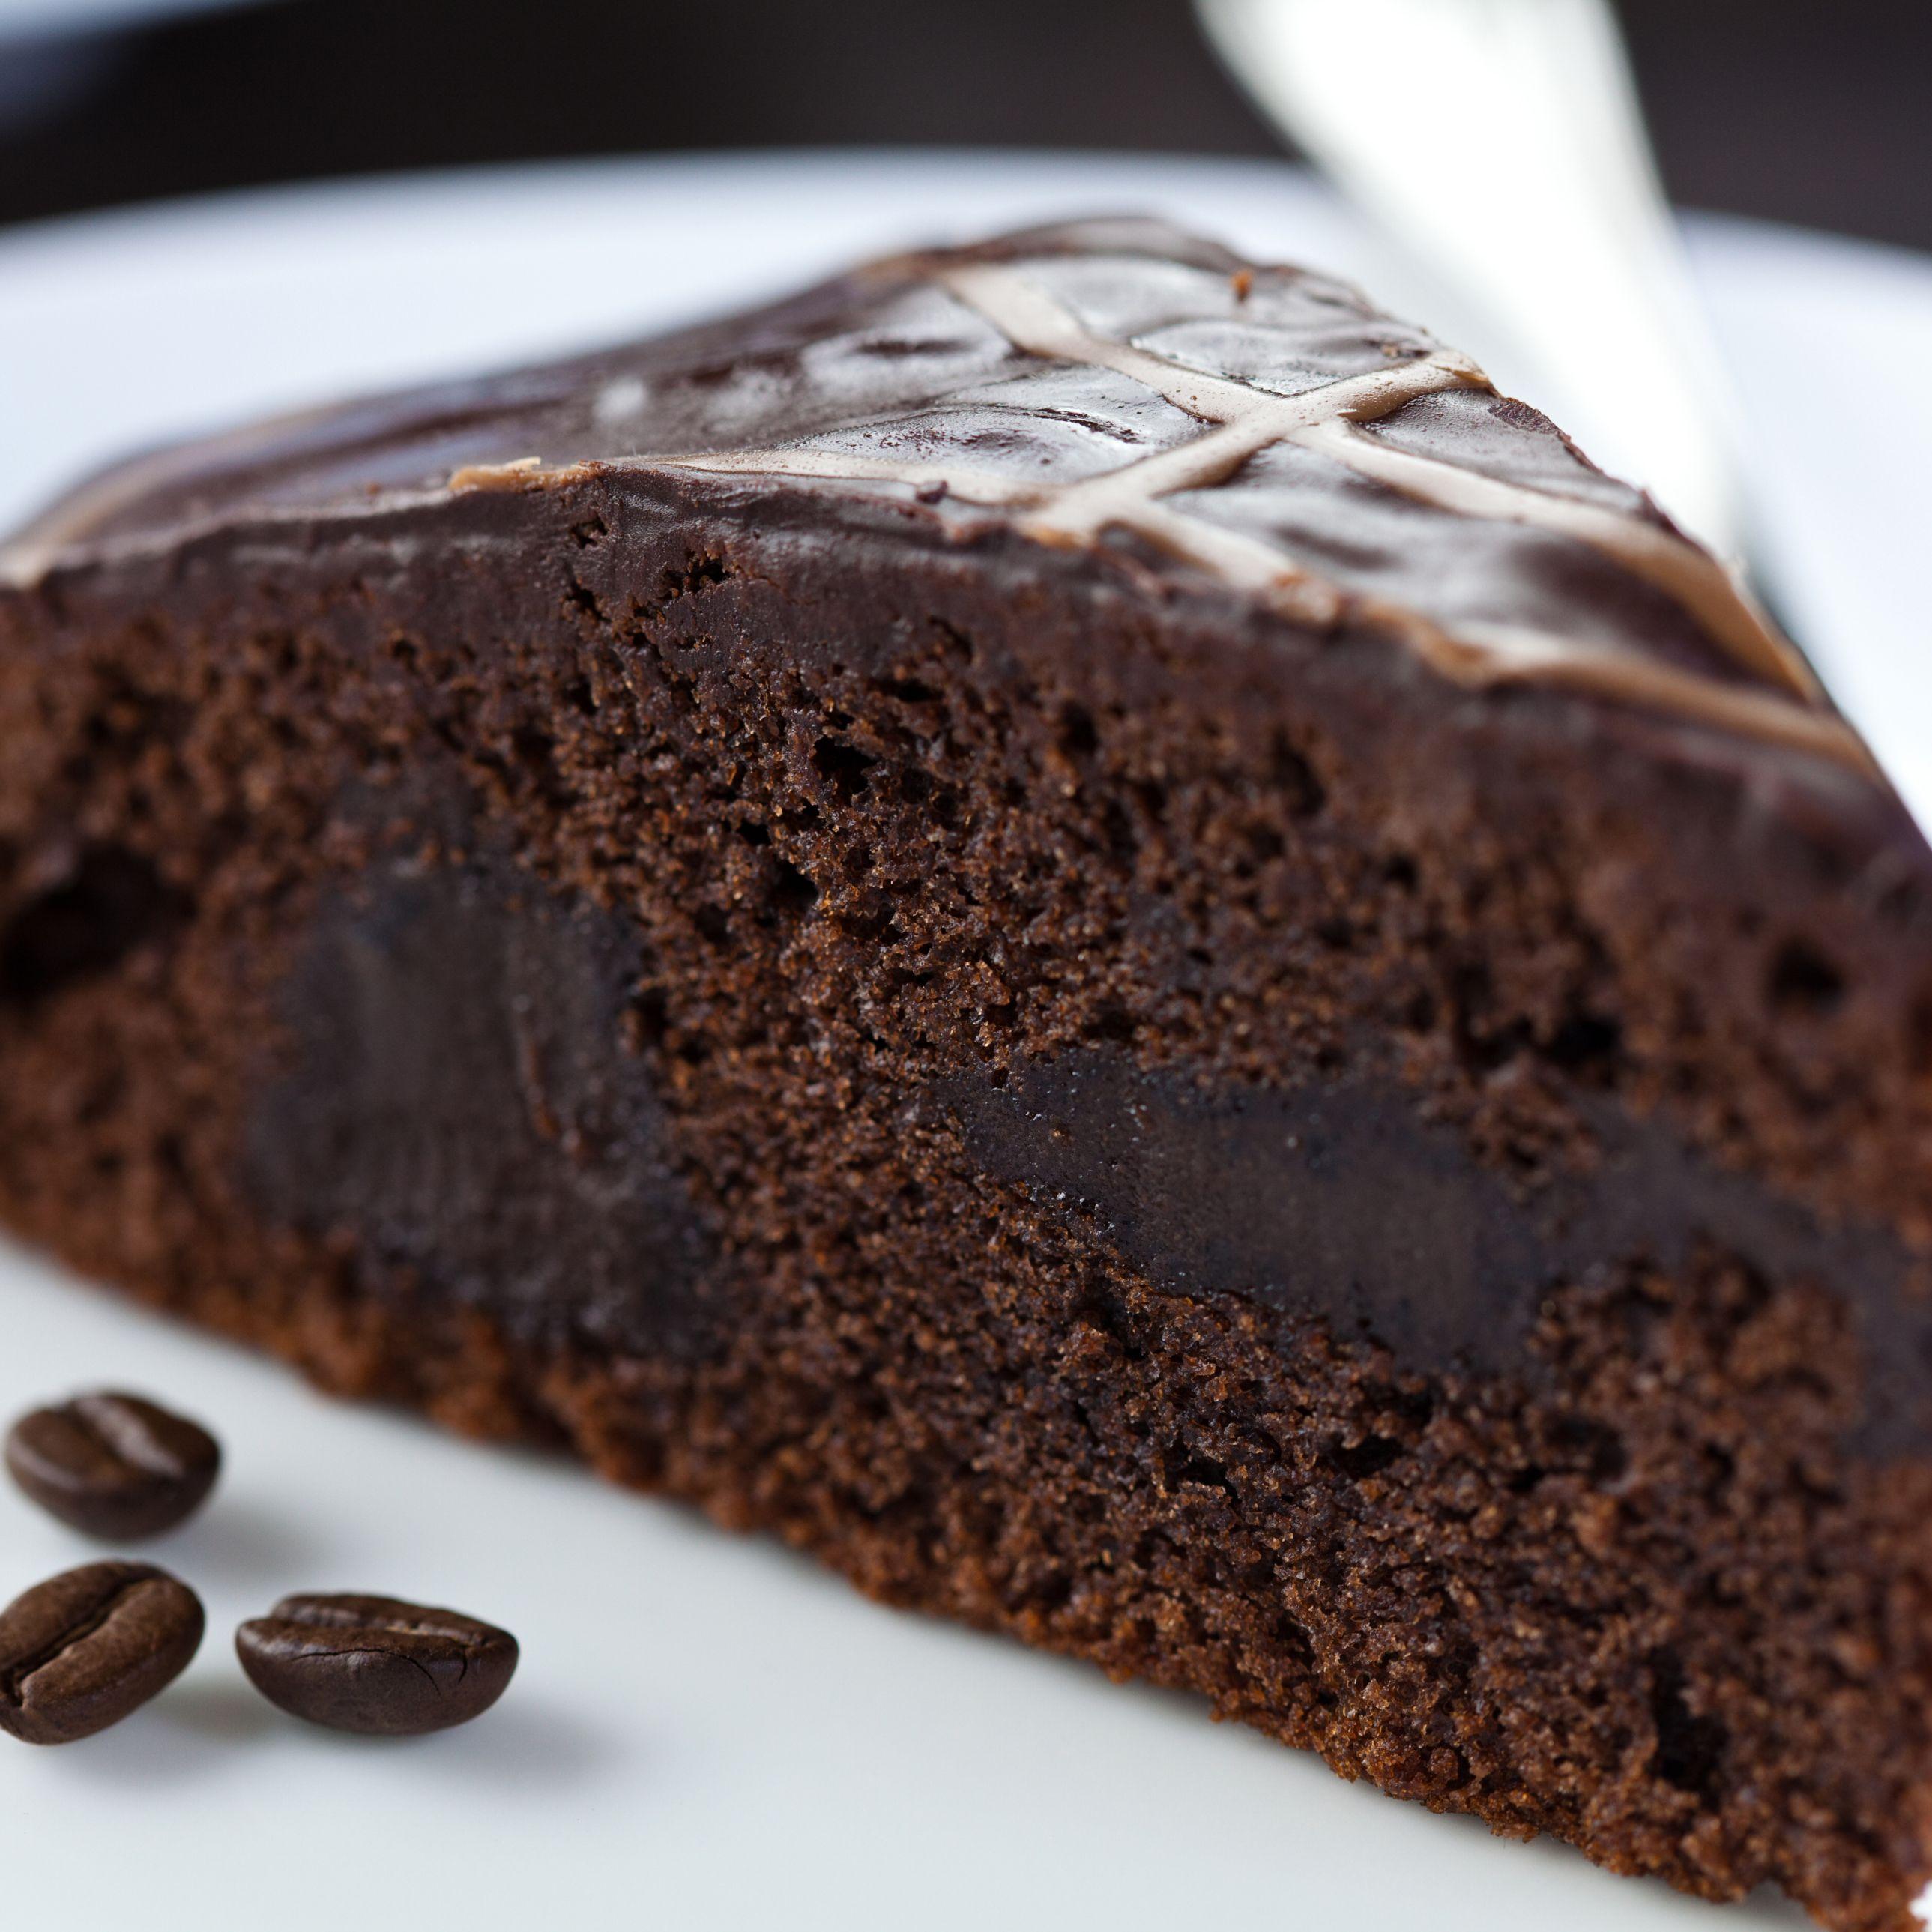 Chocolate Dump Cake Super Easy To Make I Used Cheesecake